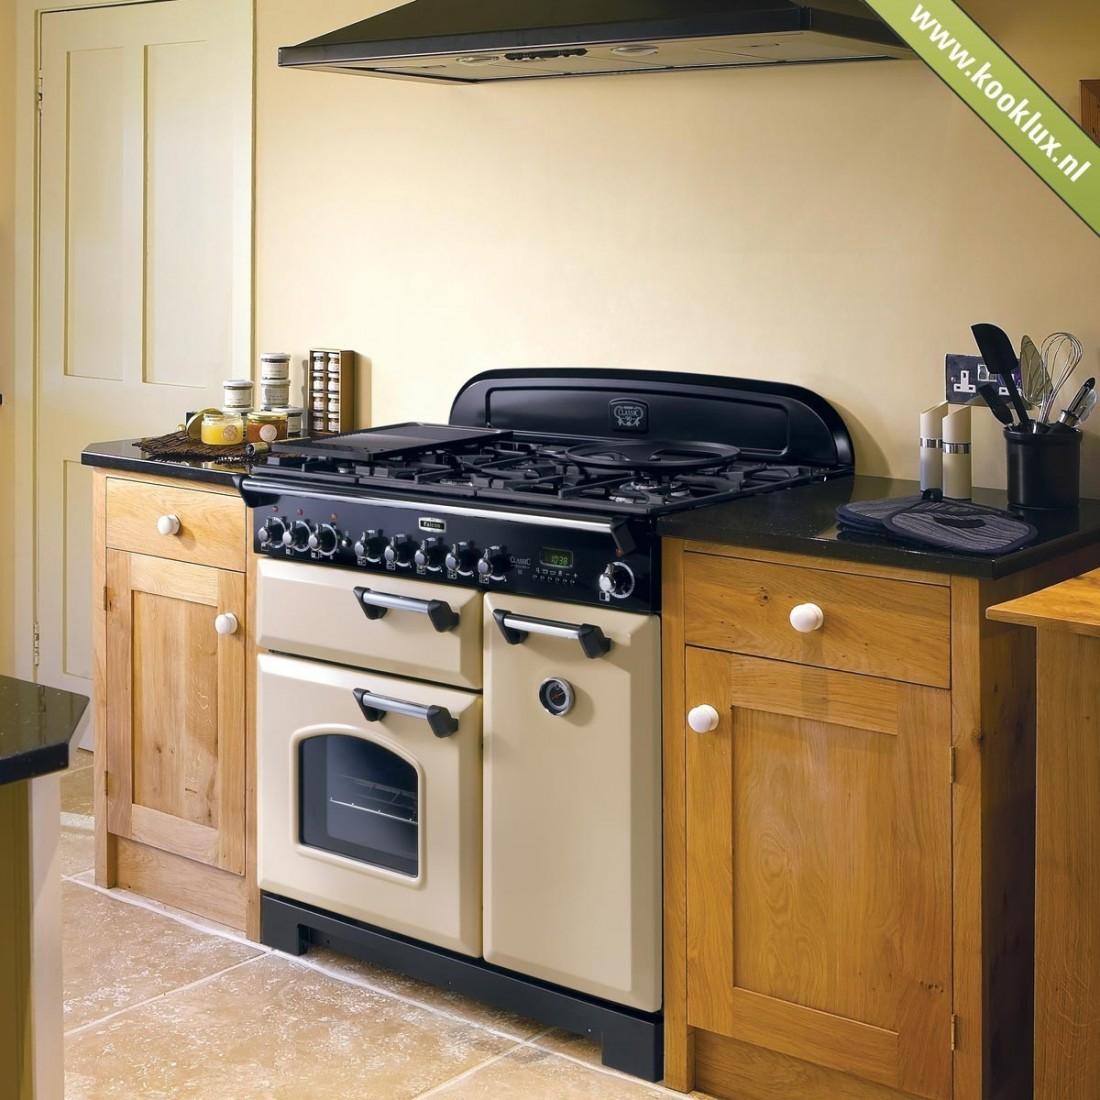 Piano de cuisson gaz falcon classic mixte 90 cm pas cher - Piano cuisine gaz ...